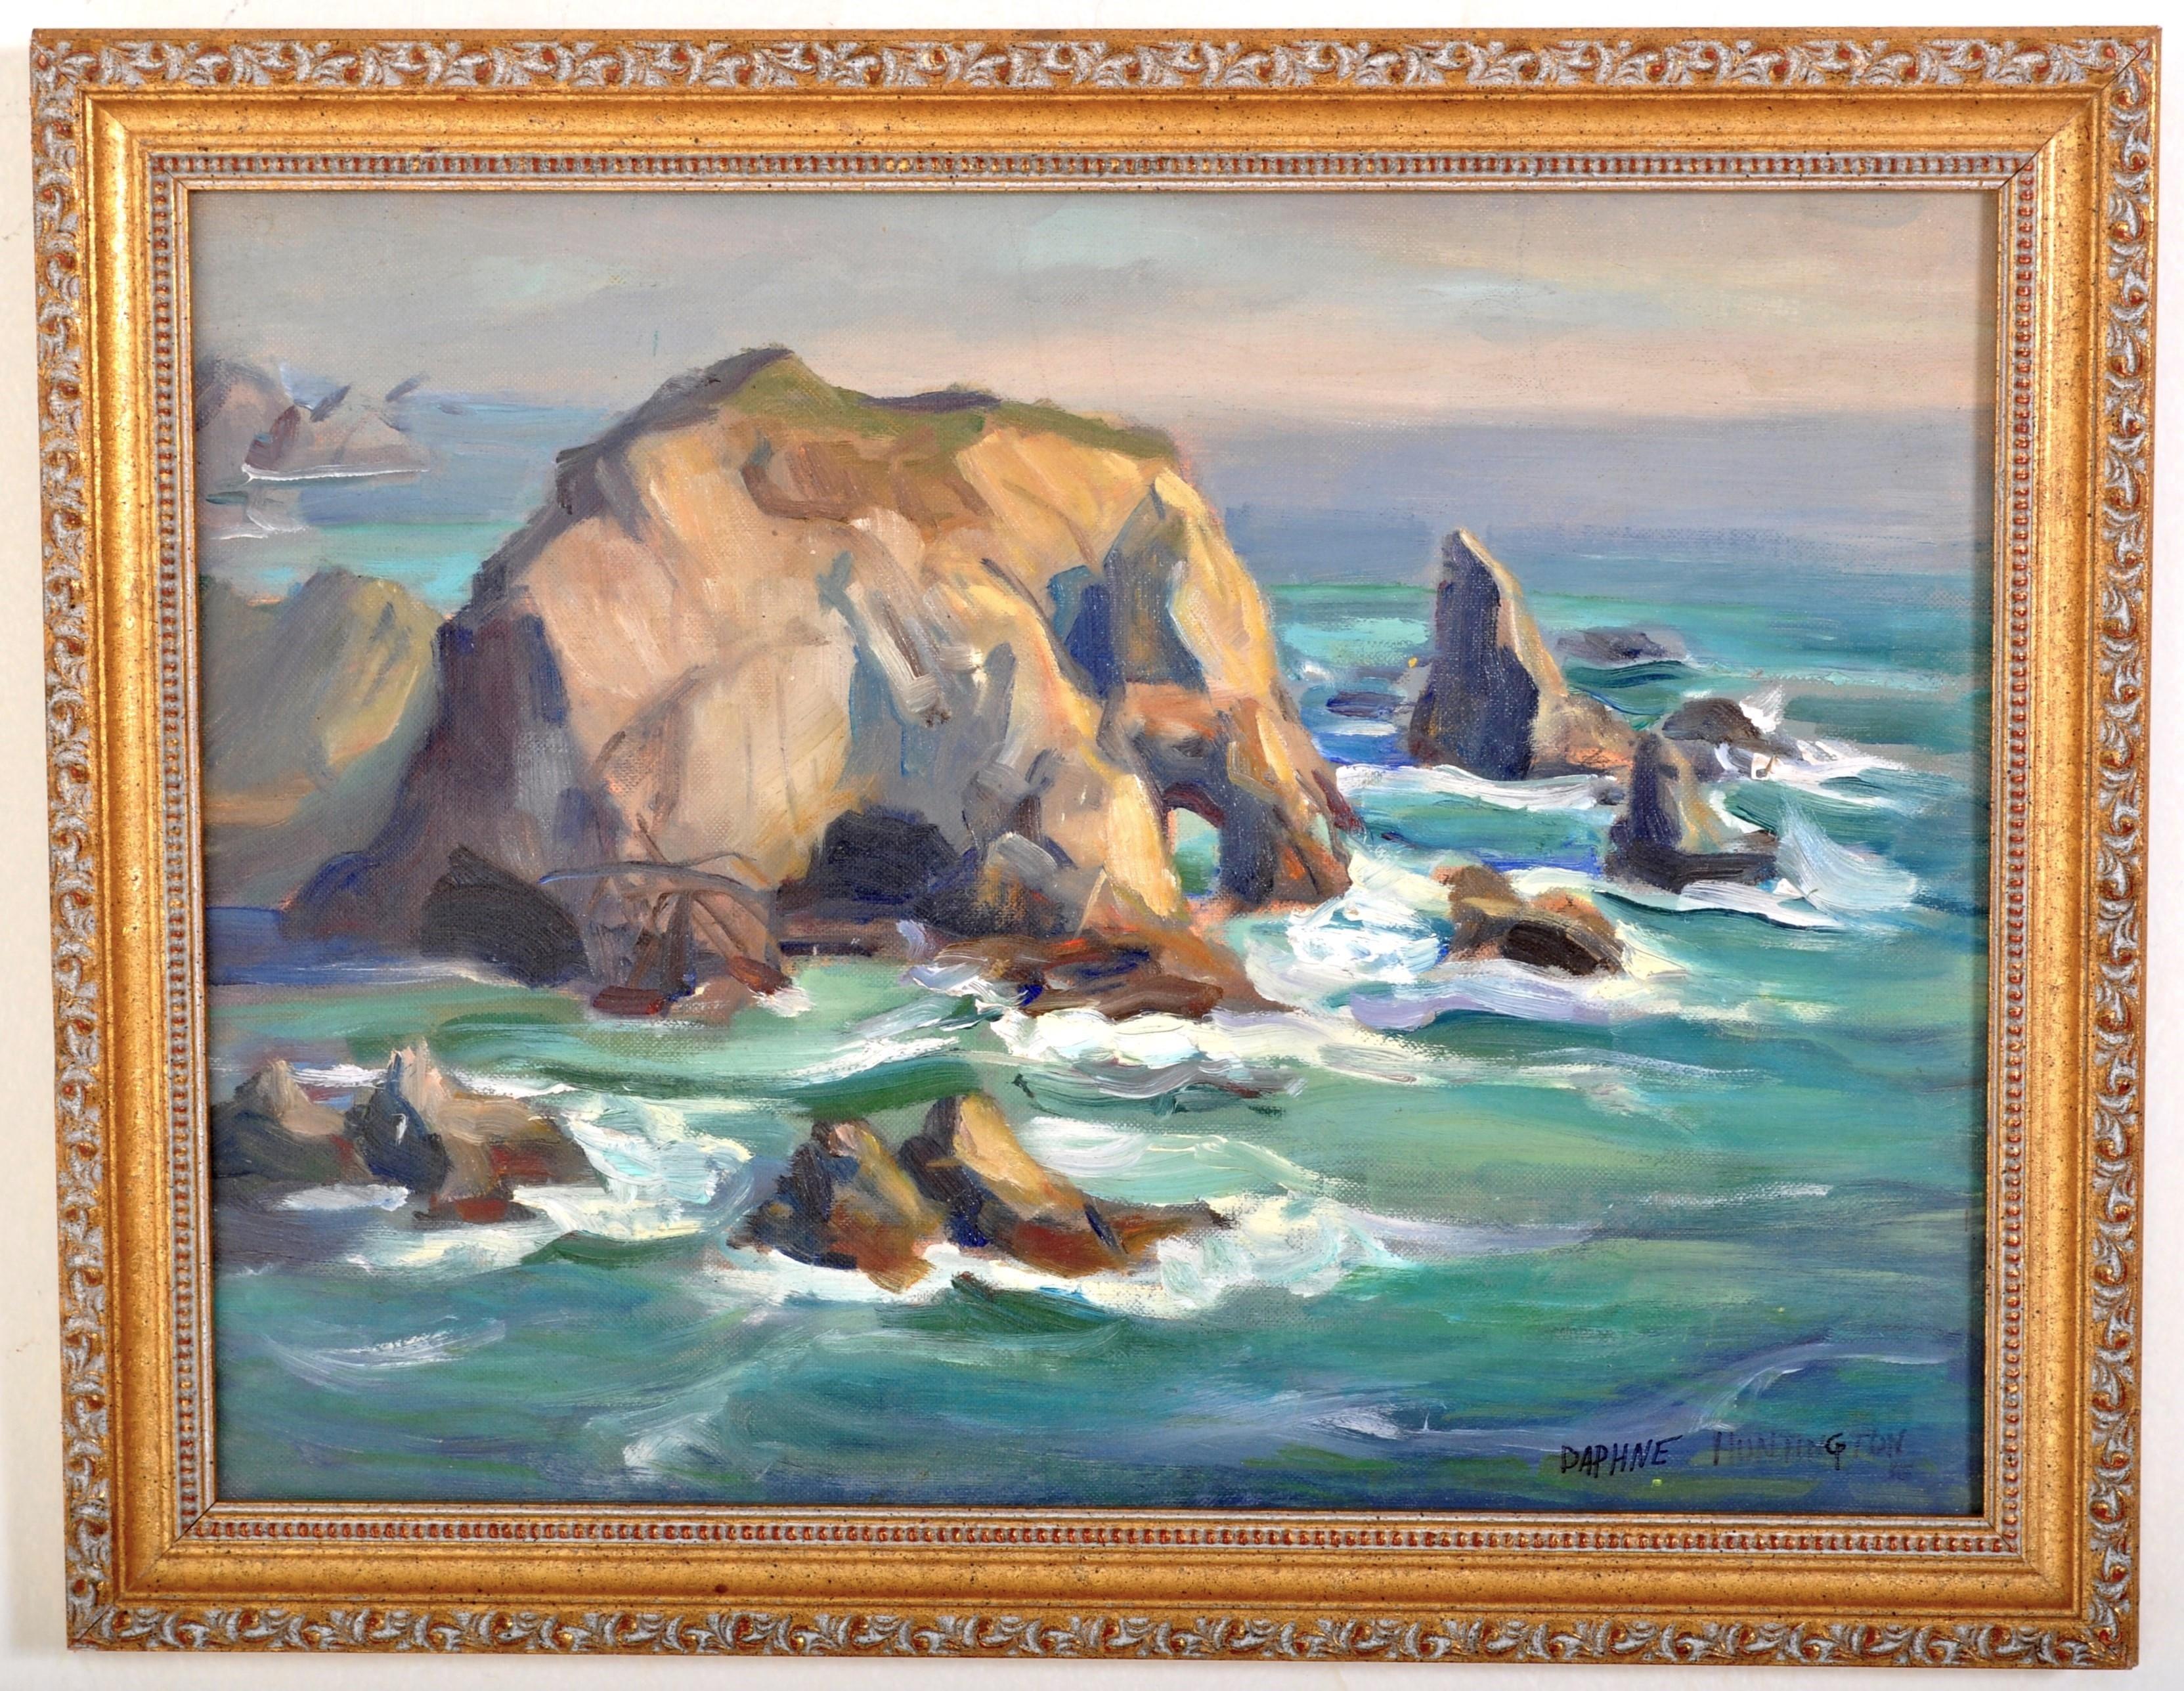 California Impressionist Oil on Canvas Painting Seascape Rocks at Malibu 1930's